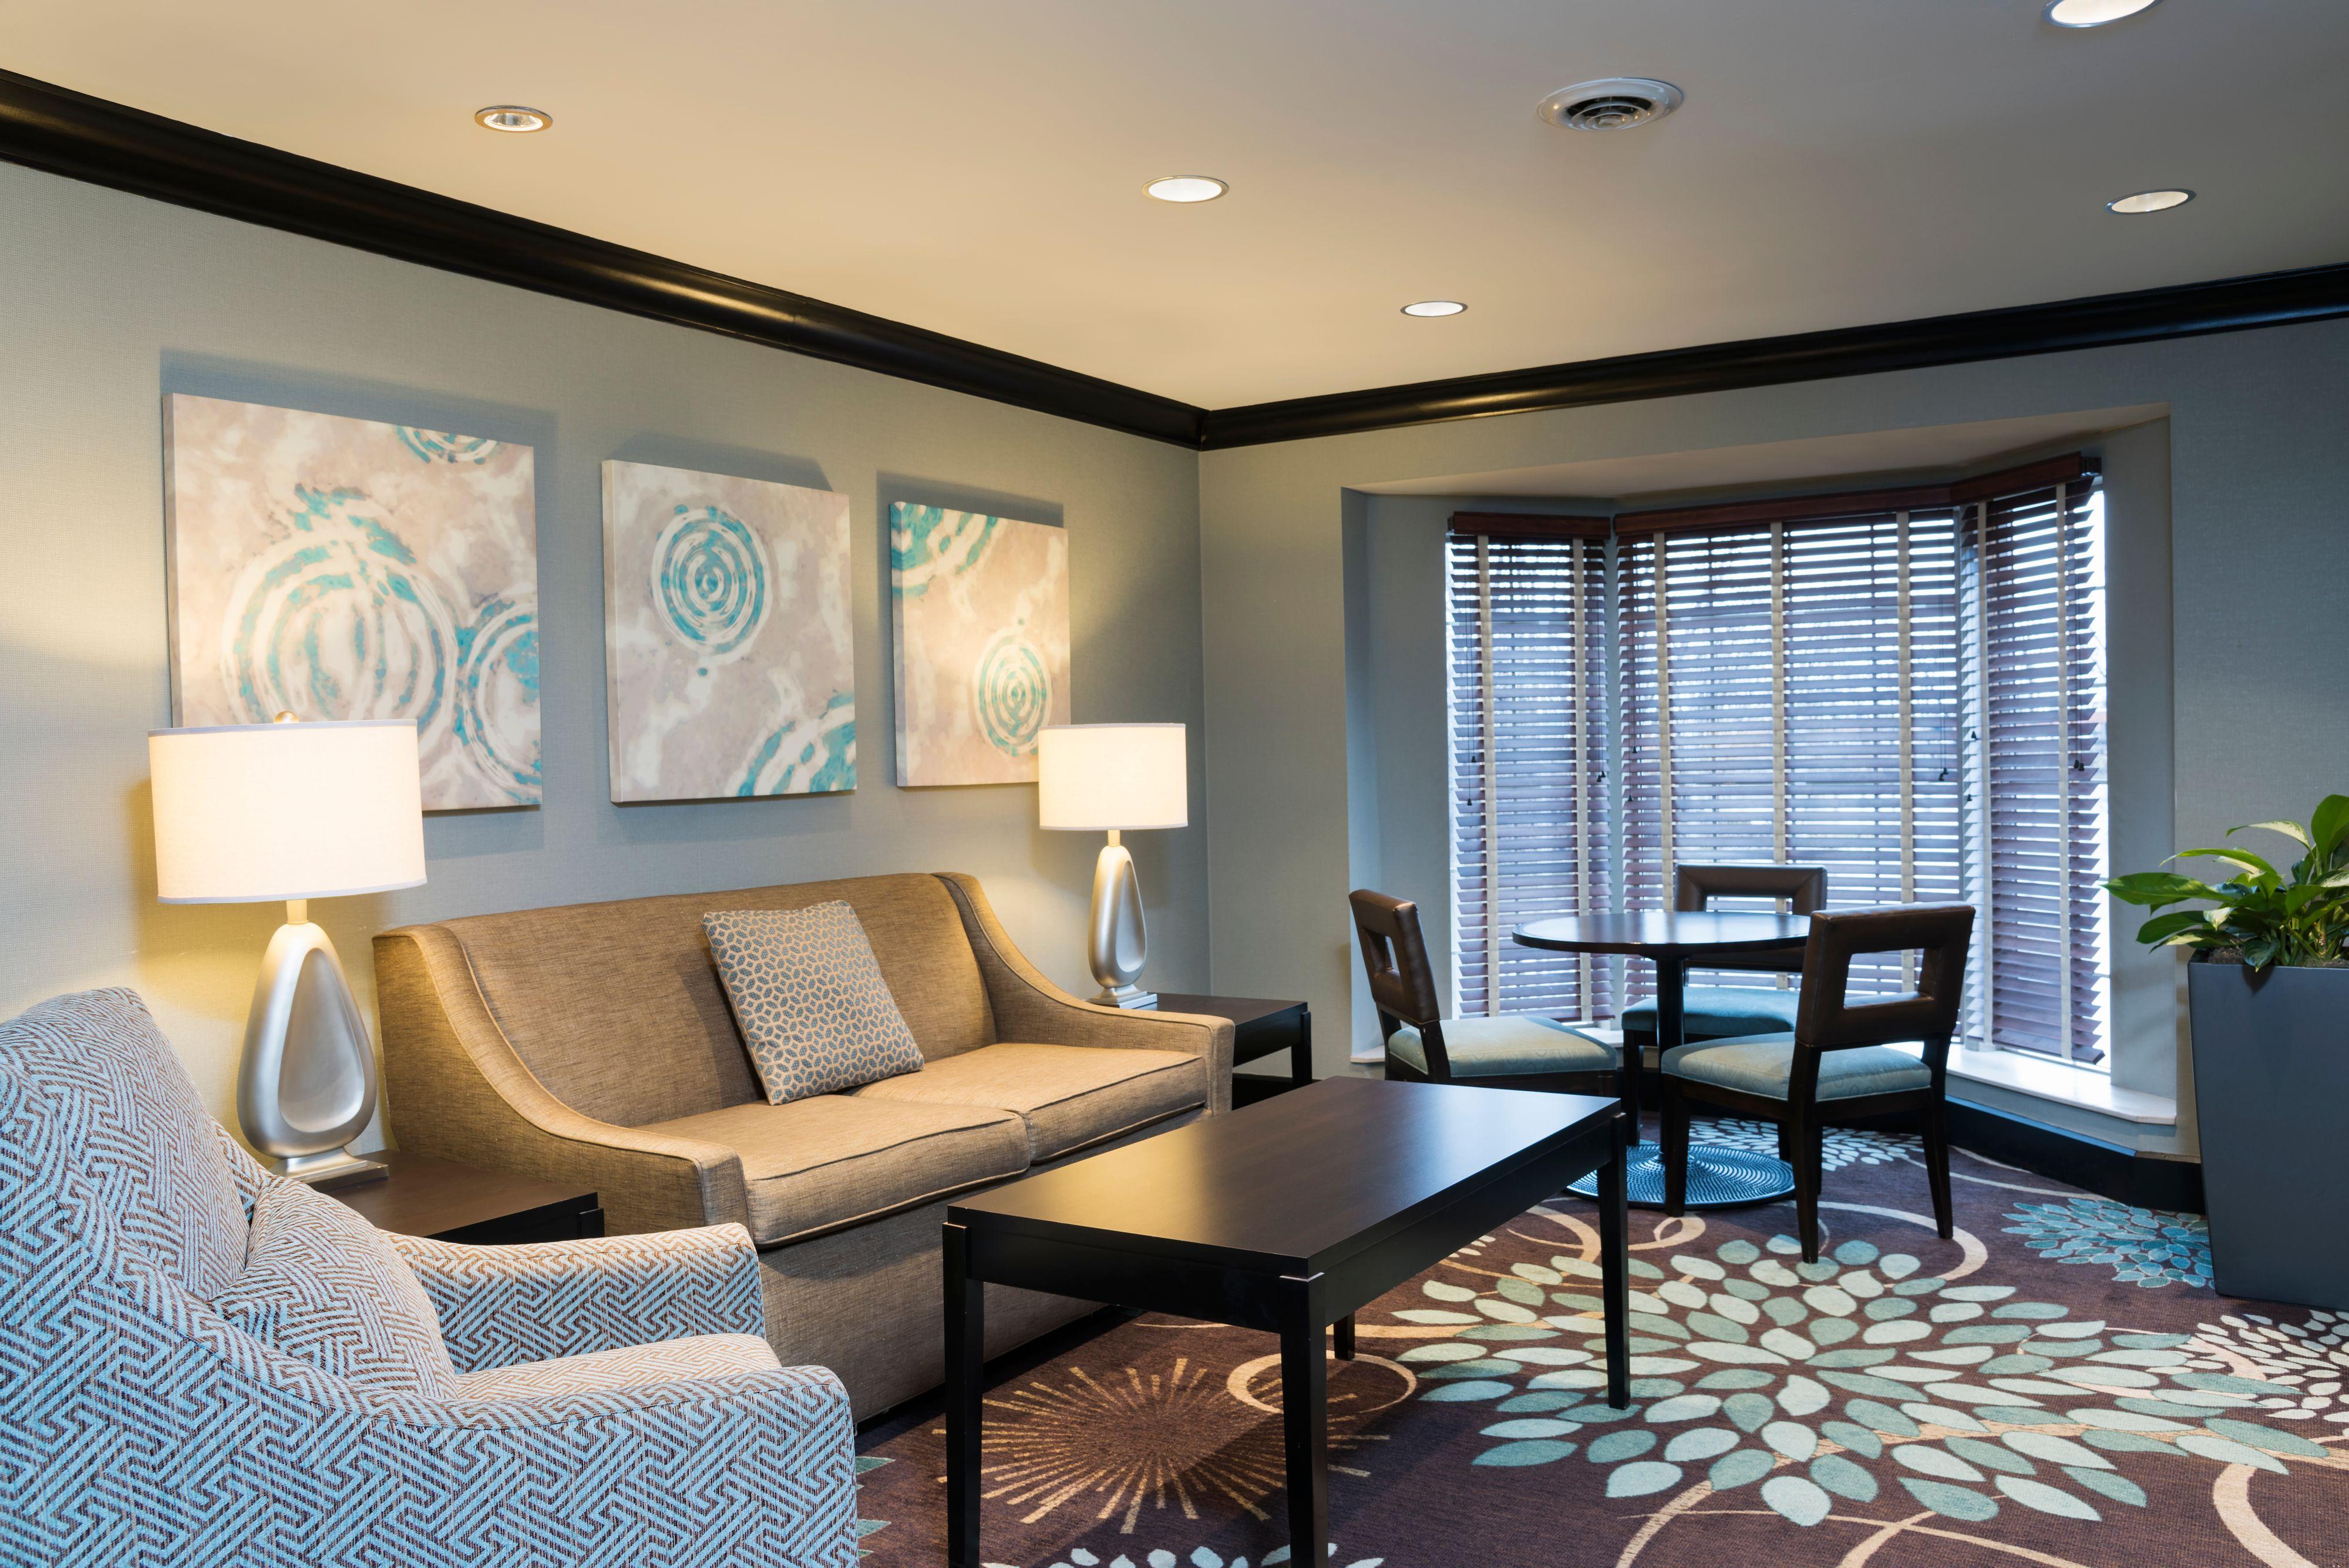 staybridge-suites-oakbrook-terrace-4960033074-original.jpg